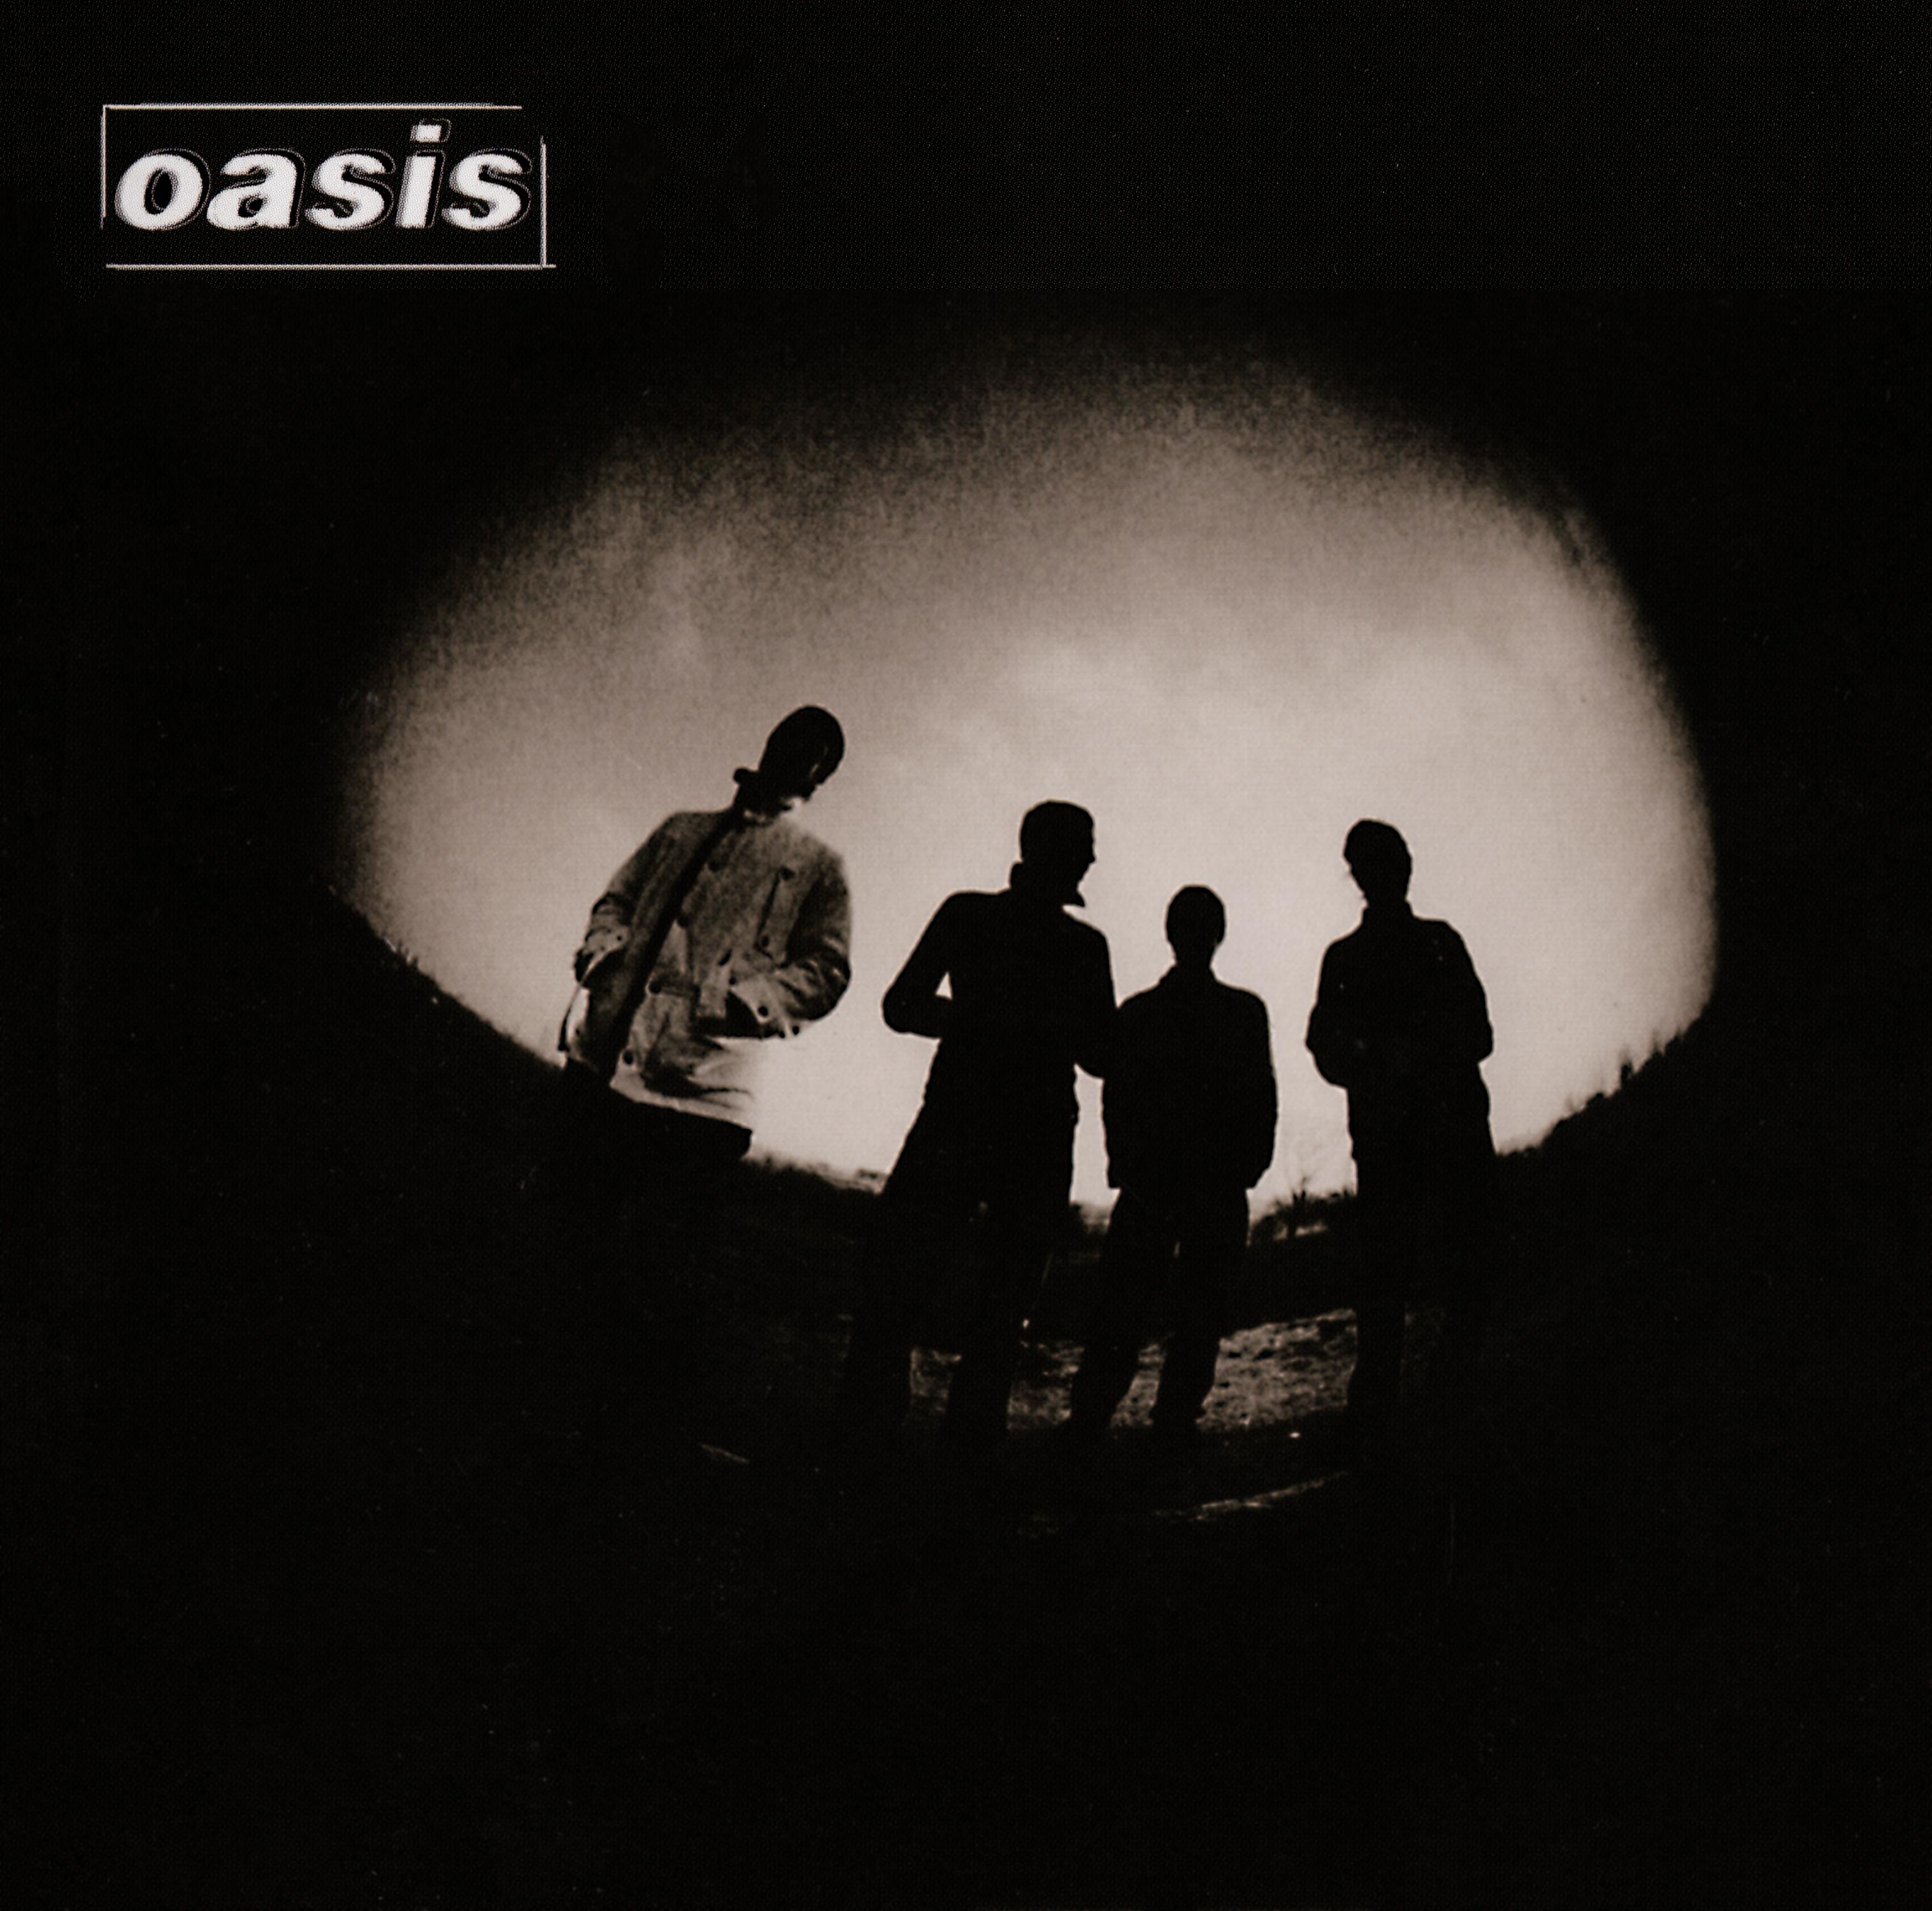 oasis (オアシス) シングル『LYLA (ライラ)』(2005年5月11日発売) 高画質CDジャケット画像 (ジャケ写)